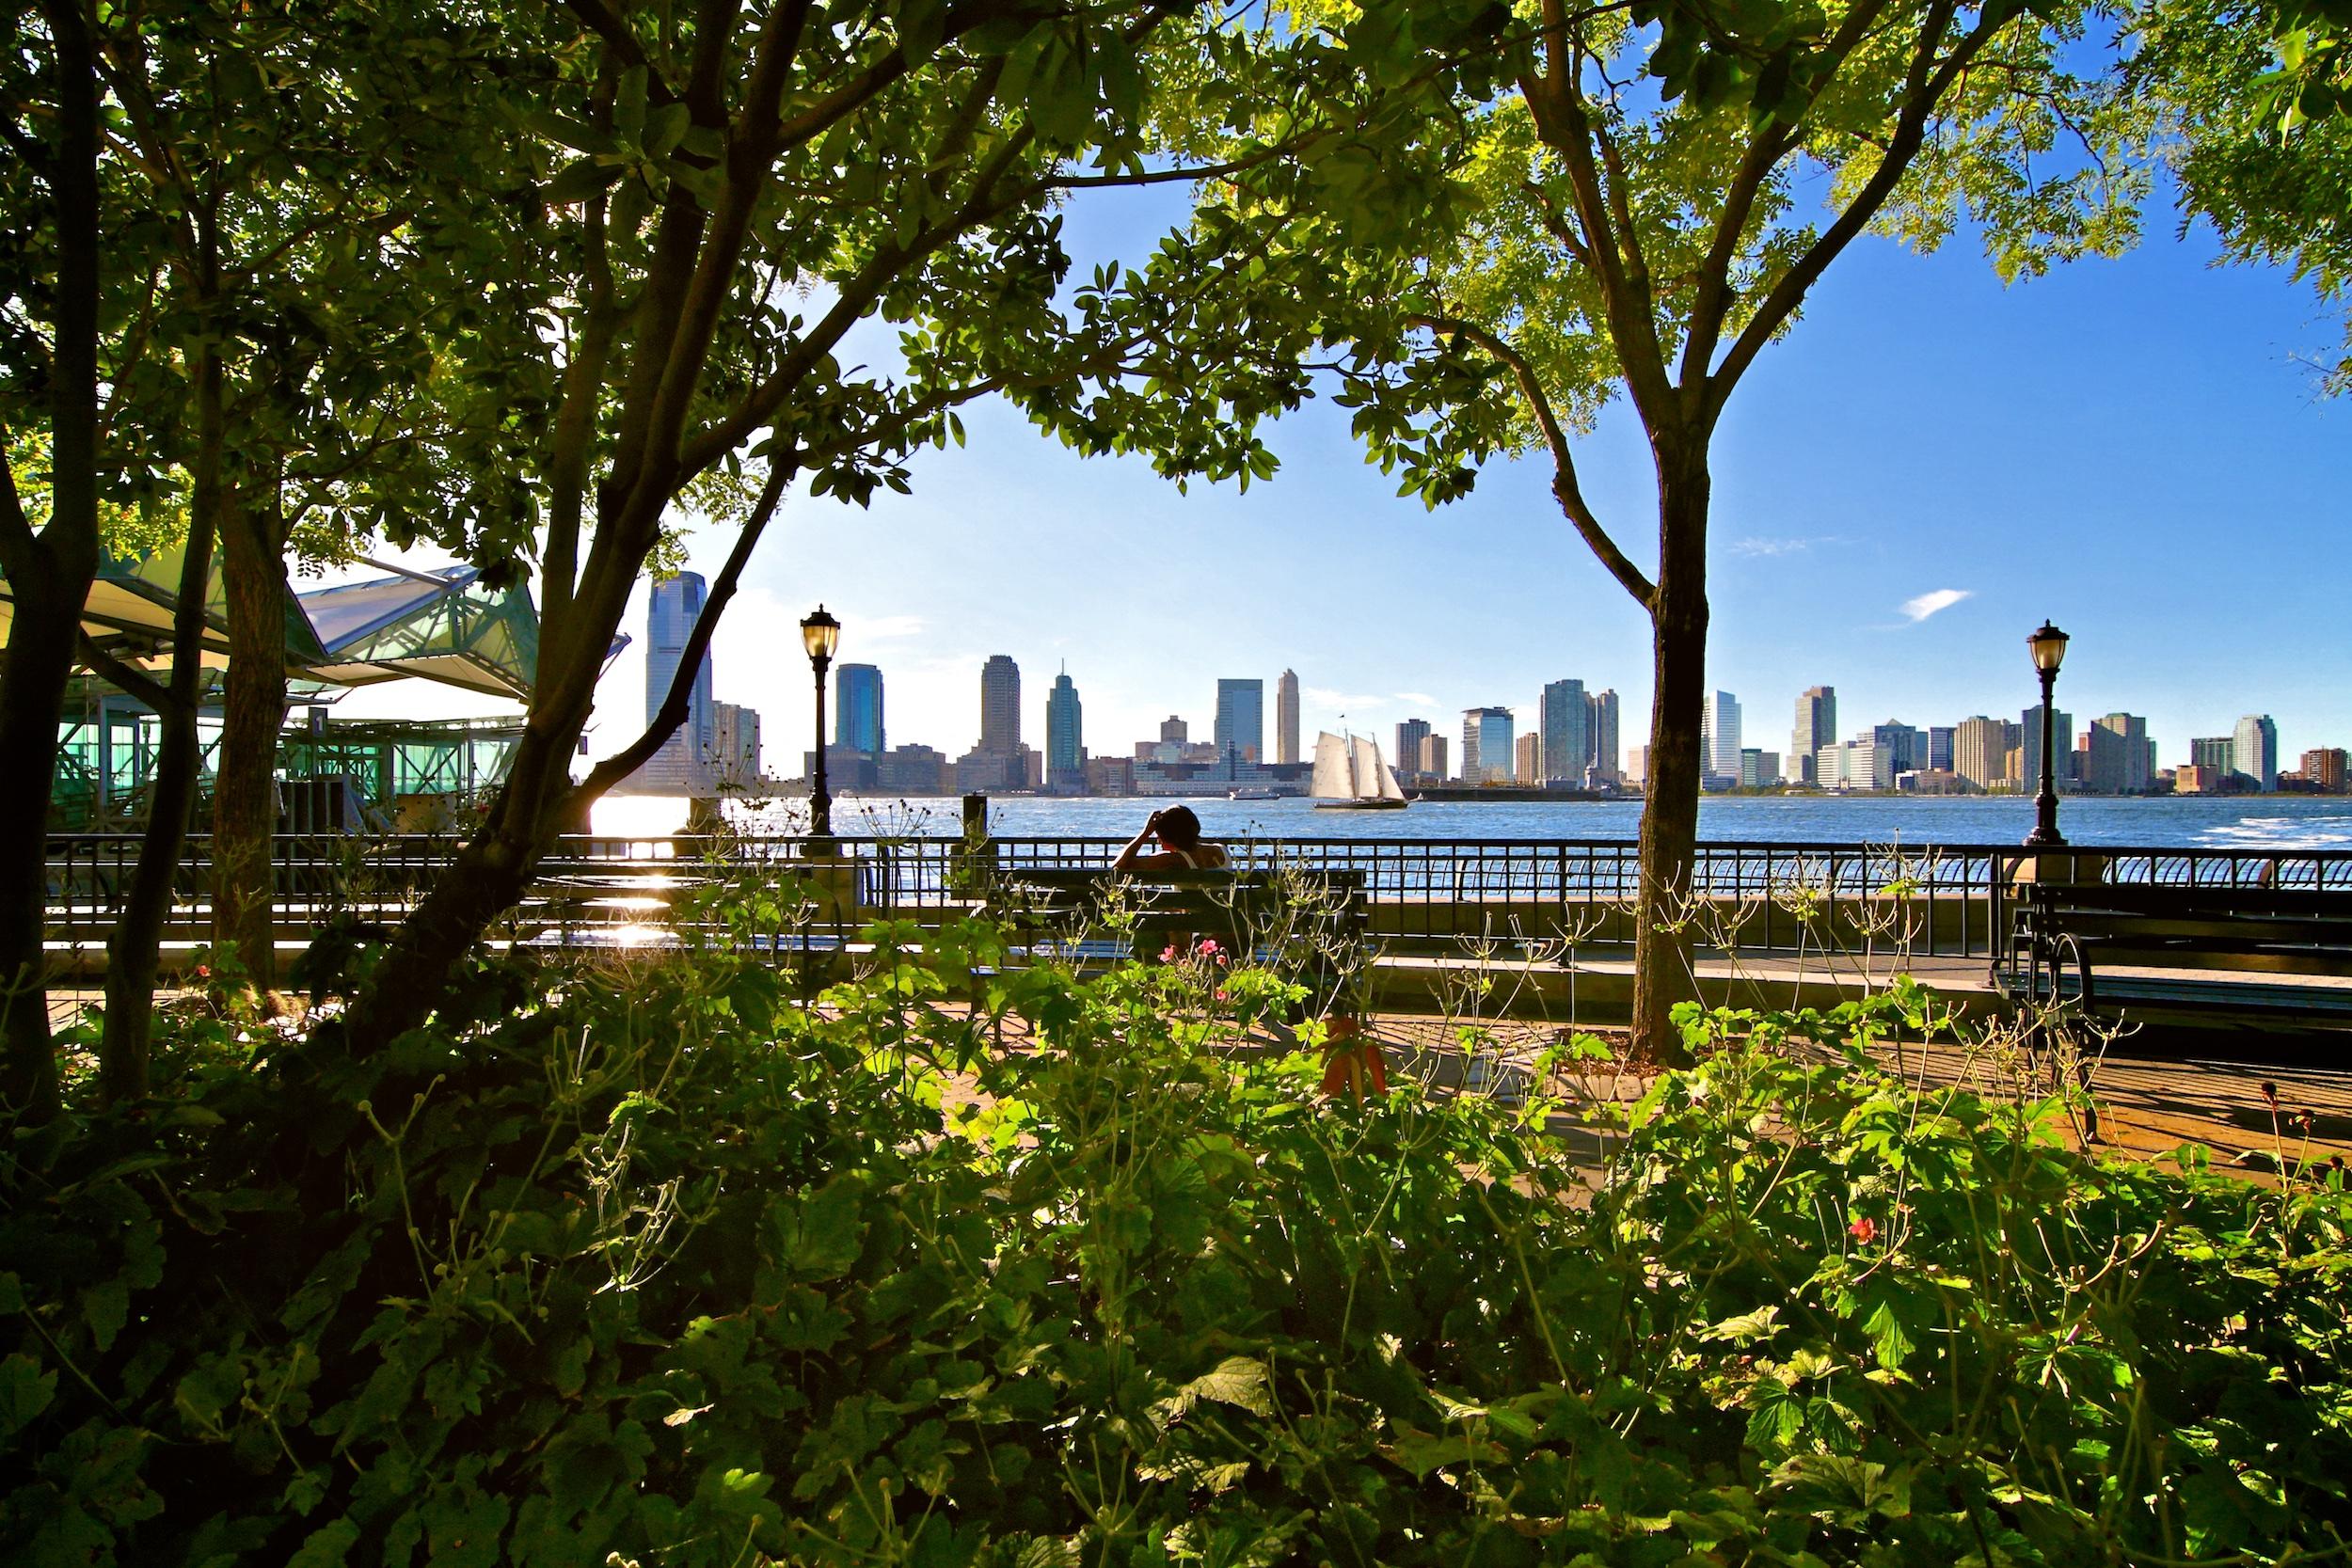 The Riverhouse Battery Park City